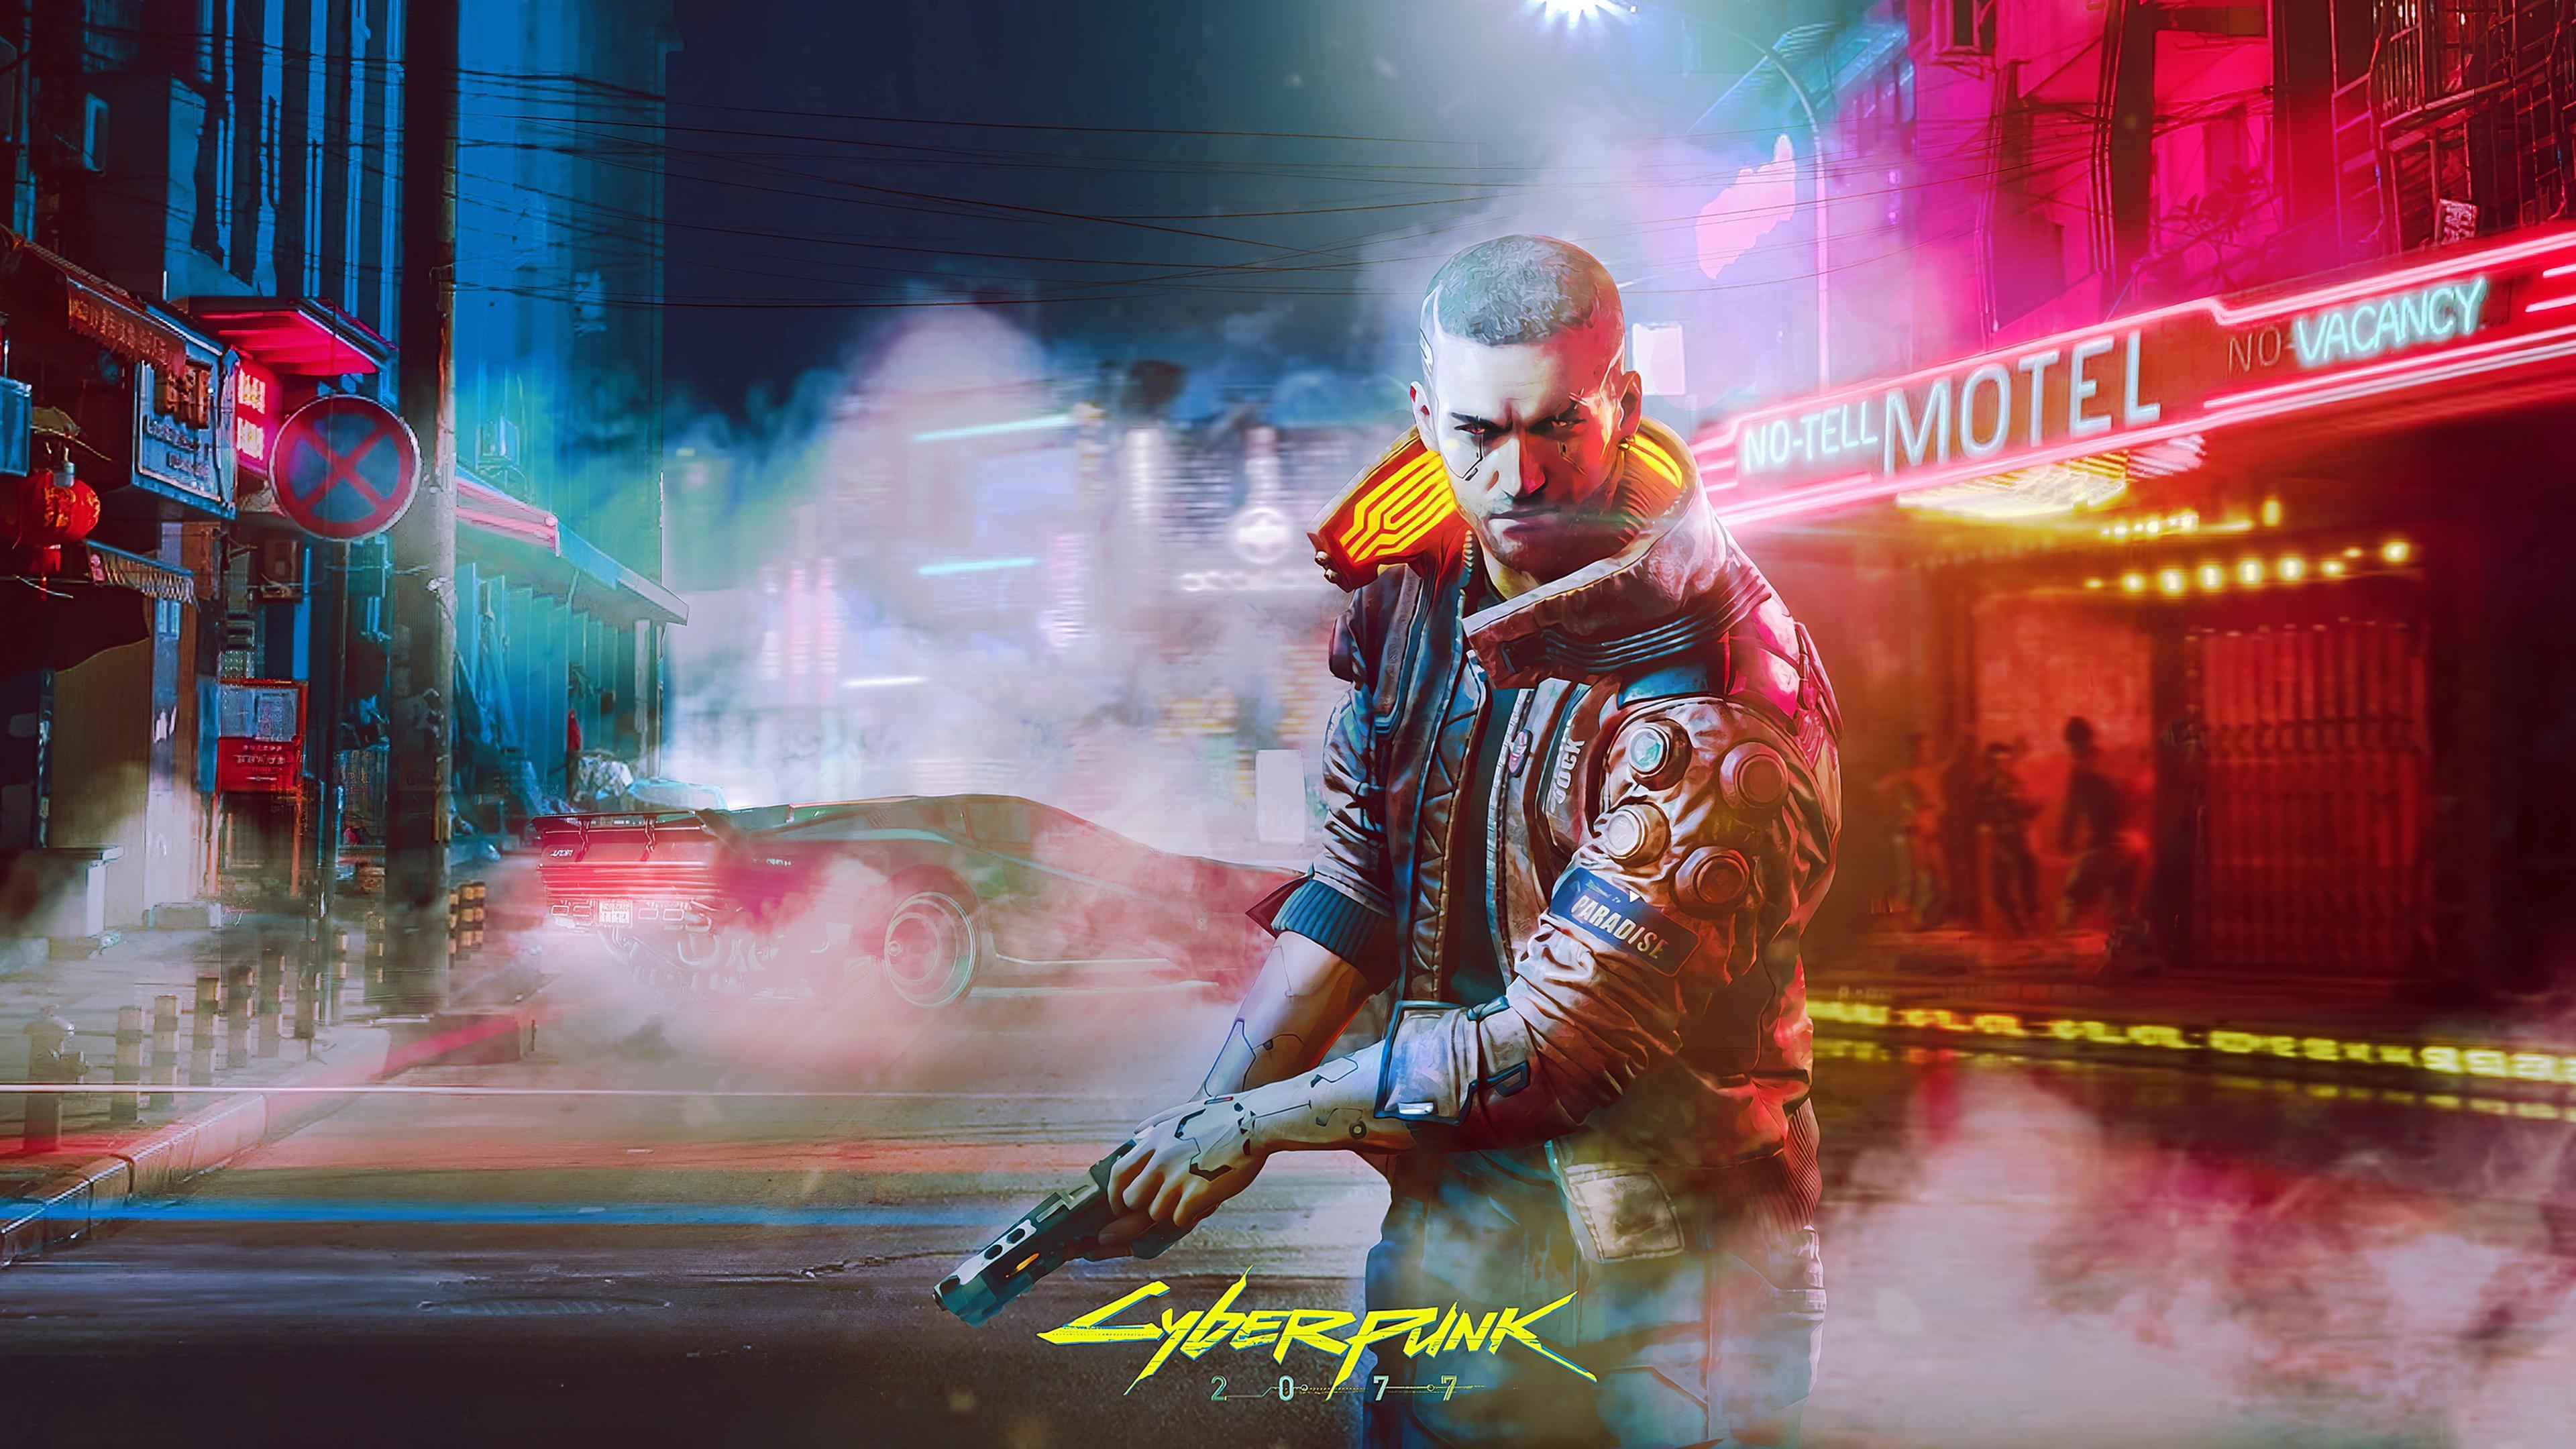 2020 cyberpunk 2077 4k 3840x2160 1 - 2020 Cyberpunk 2077 - 2020 Cyberpunk 2077 game wallpapers, 2020 Cyberpunk 2077 4k wallpapers